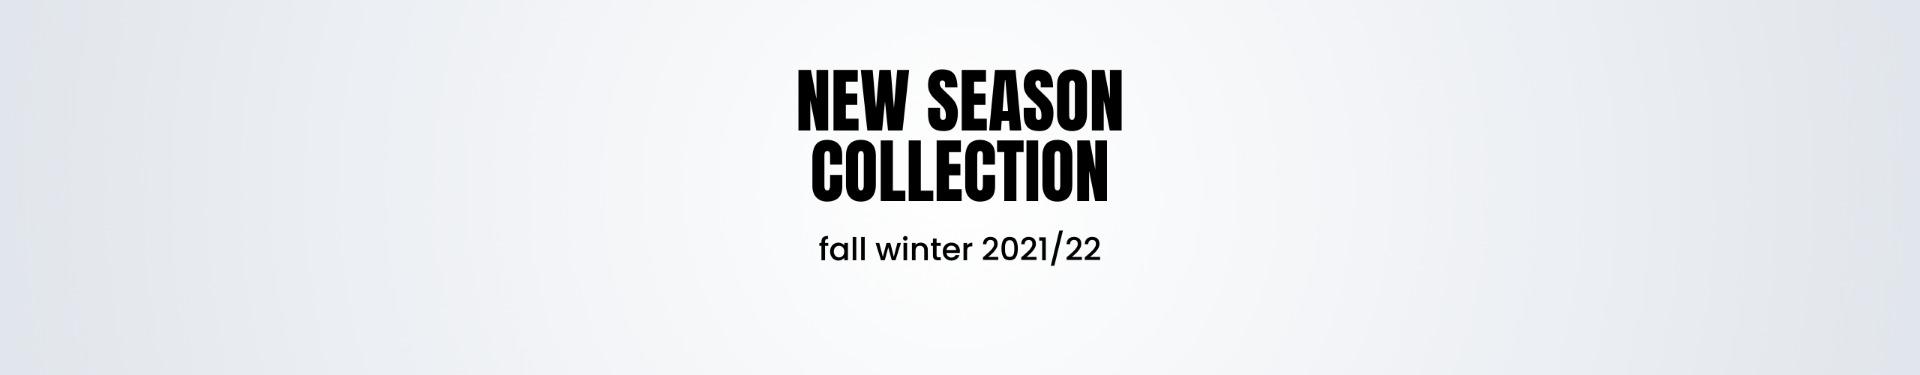 Fall/Winter 2021/2022